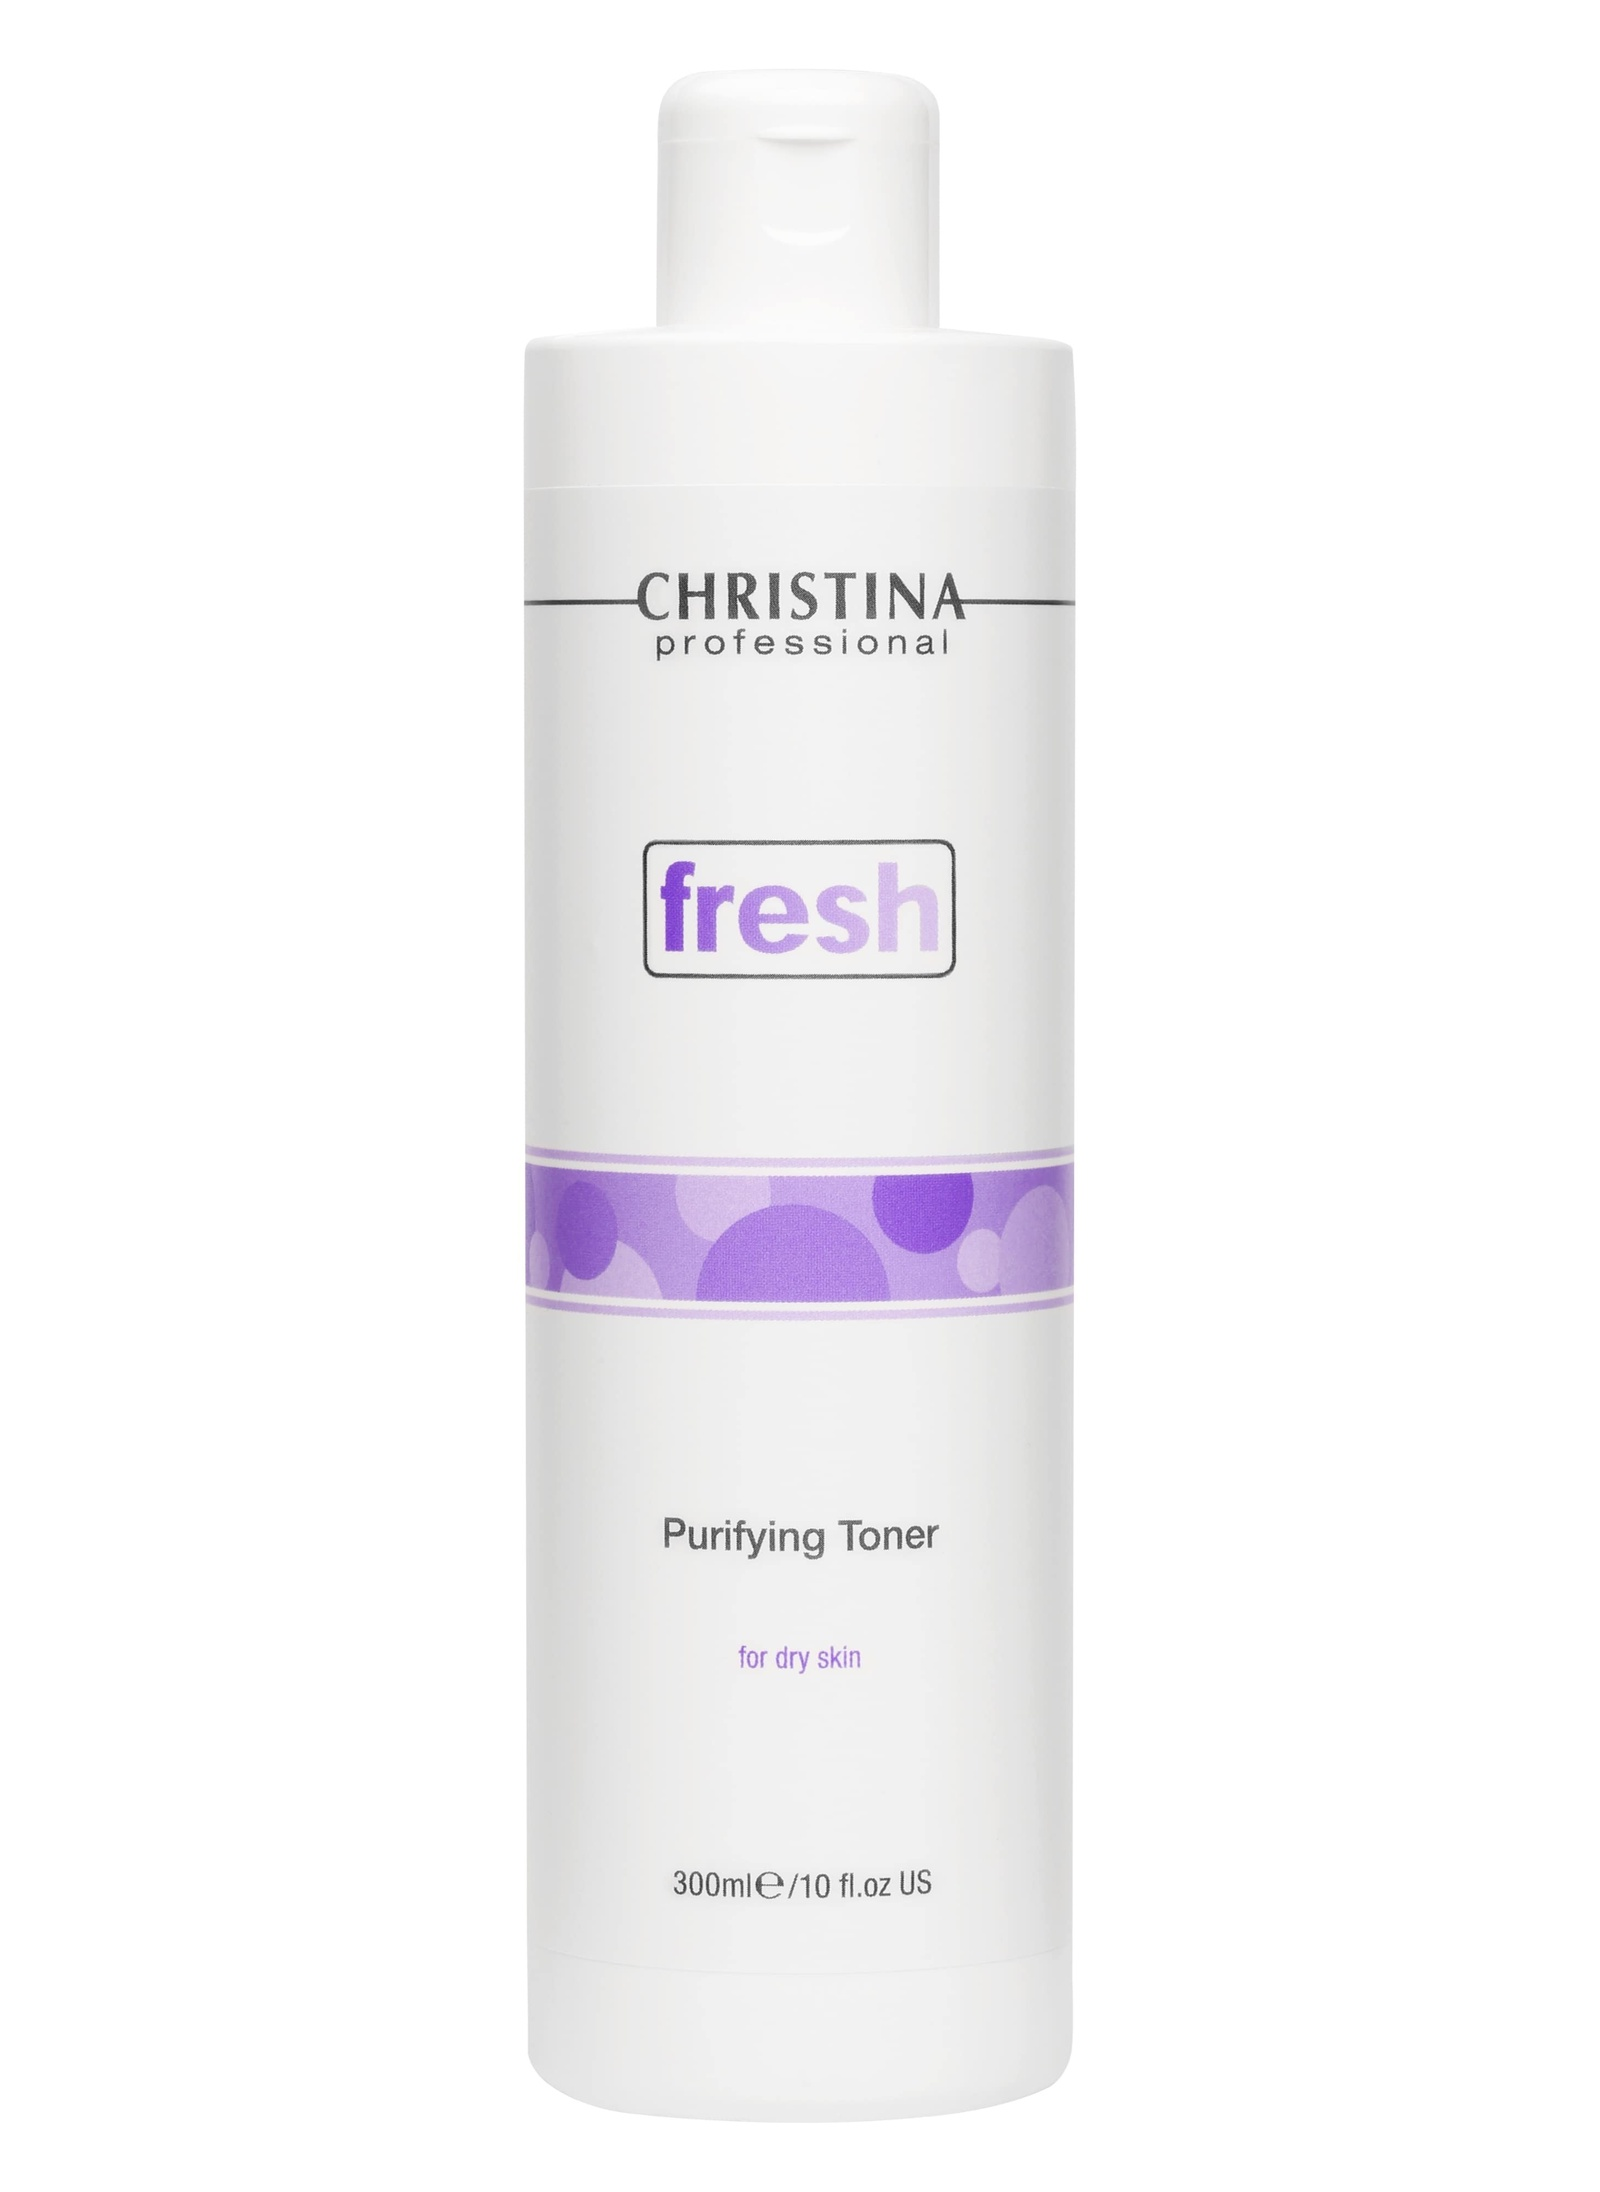 Тоник для лица CHRISTINA Fresh Purifying Toner for dry skin christina очищающий тоник с лавандой для сухой кожи purifying toner for dry skin with lavender 300 мл